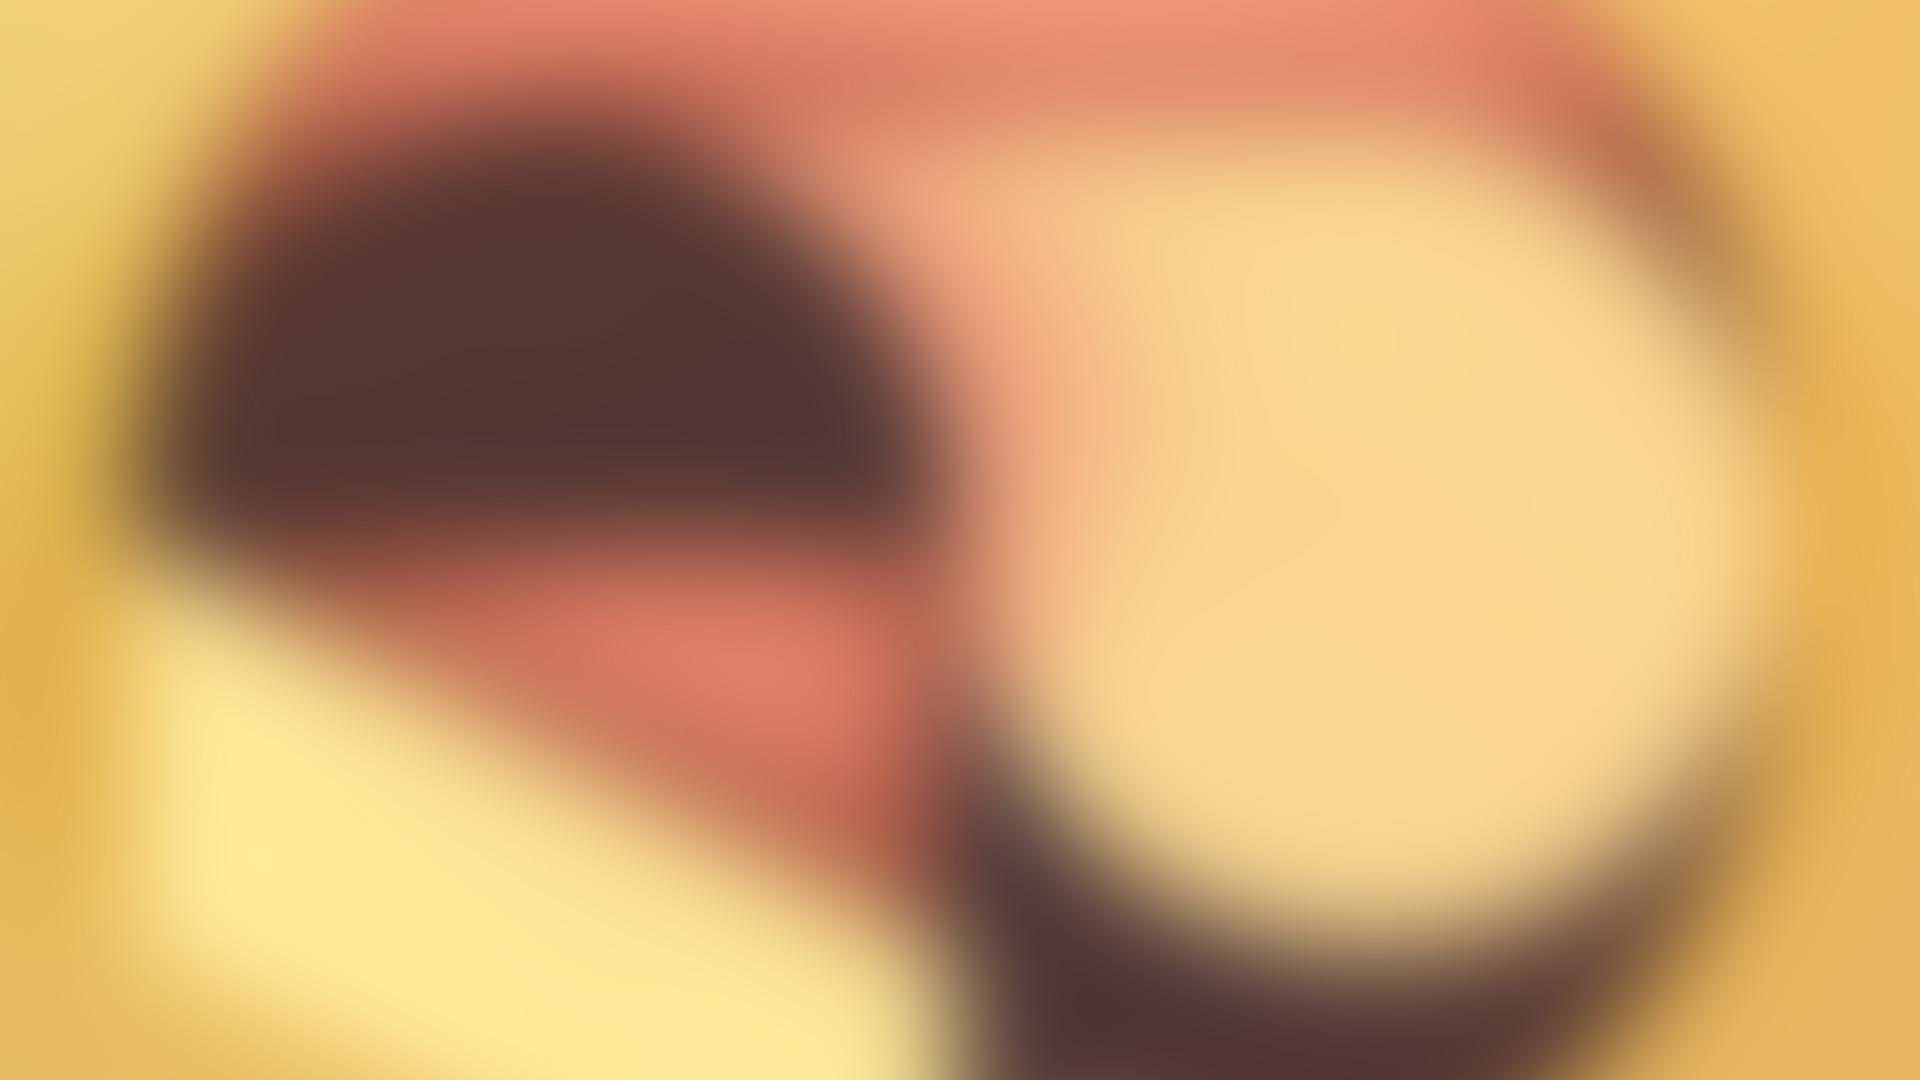 Mobilee233_AlexMedina_WavesFromOneSea_bg-blur